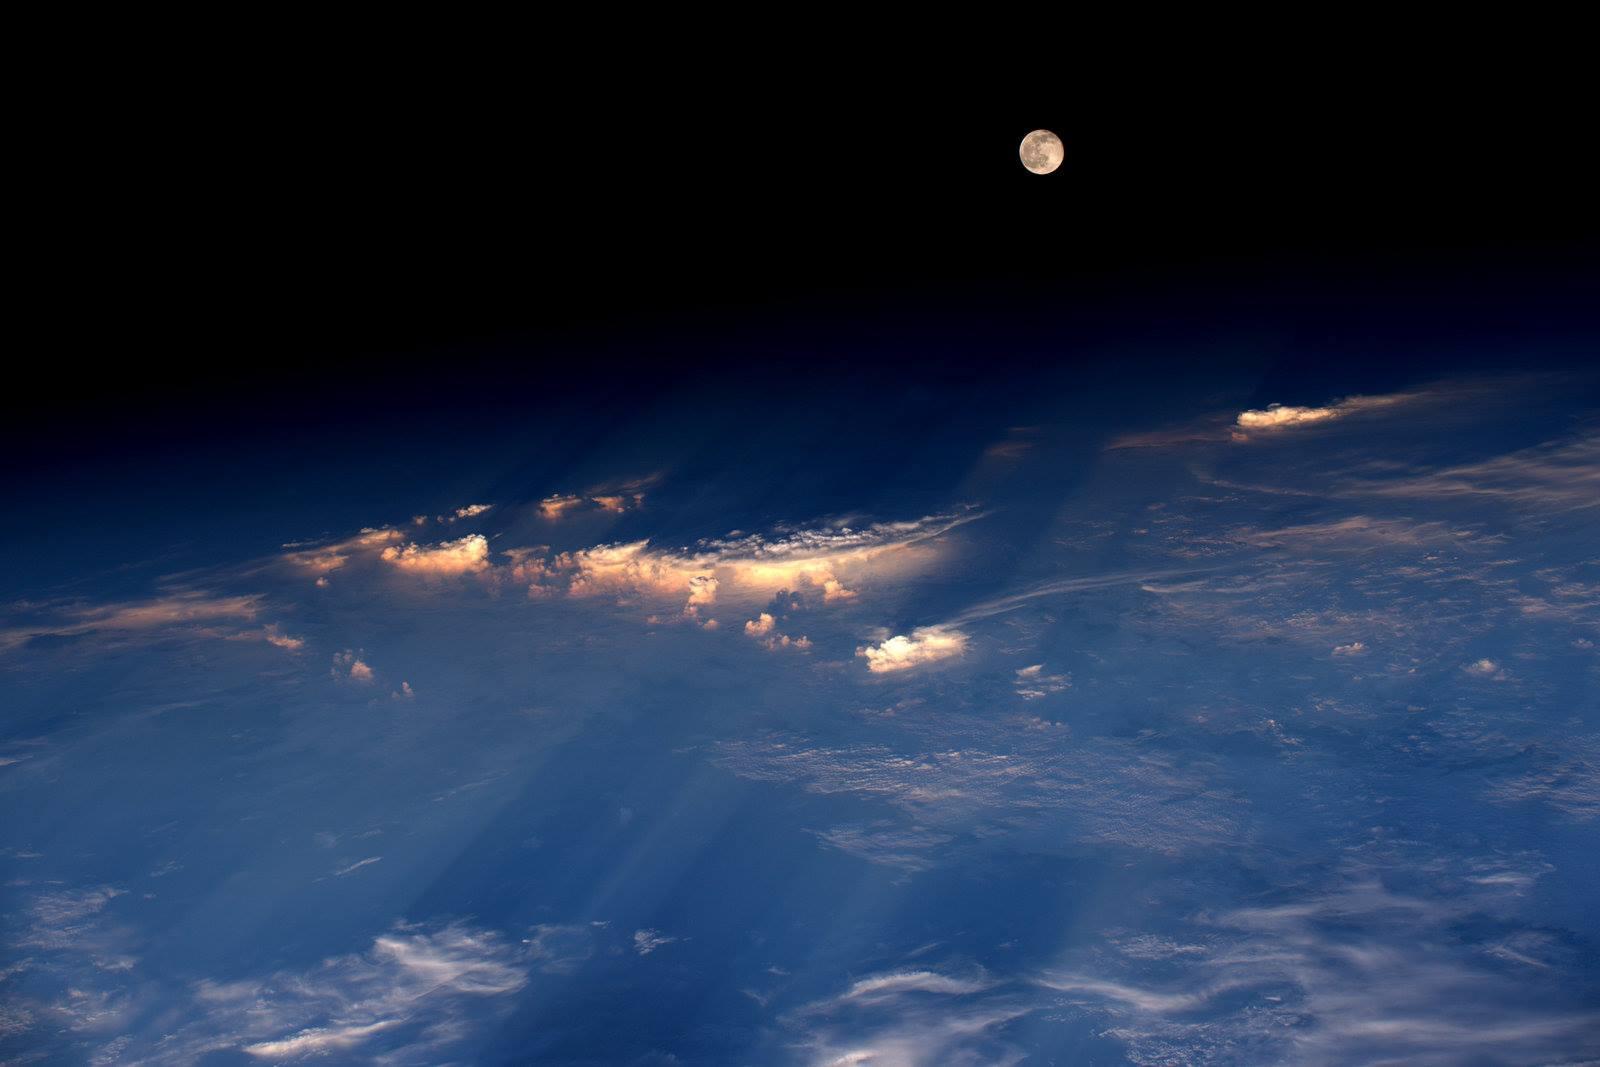 Delicious 'Strawberry Moon' Photos: Rare Solstice Lunar Show Wows Stargazers